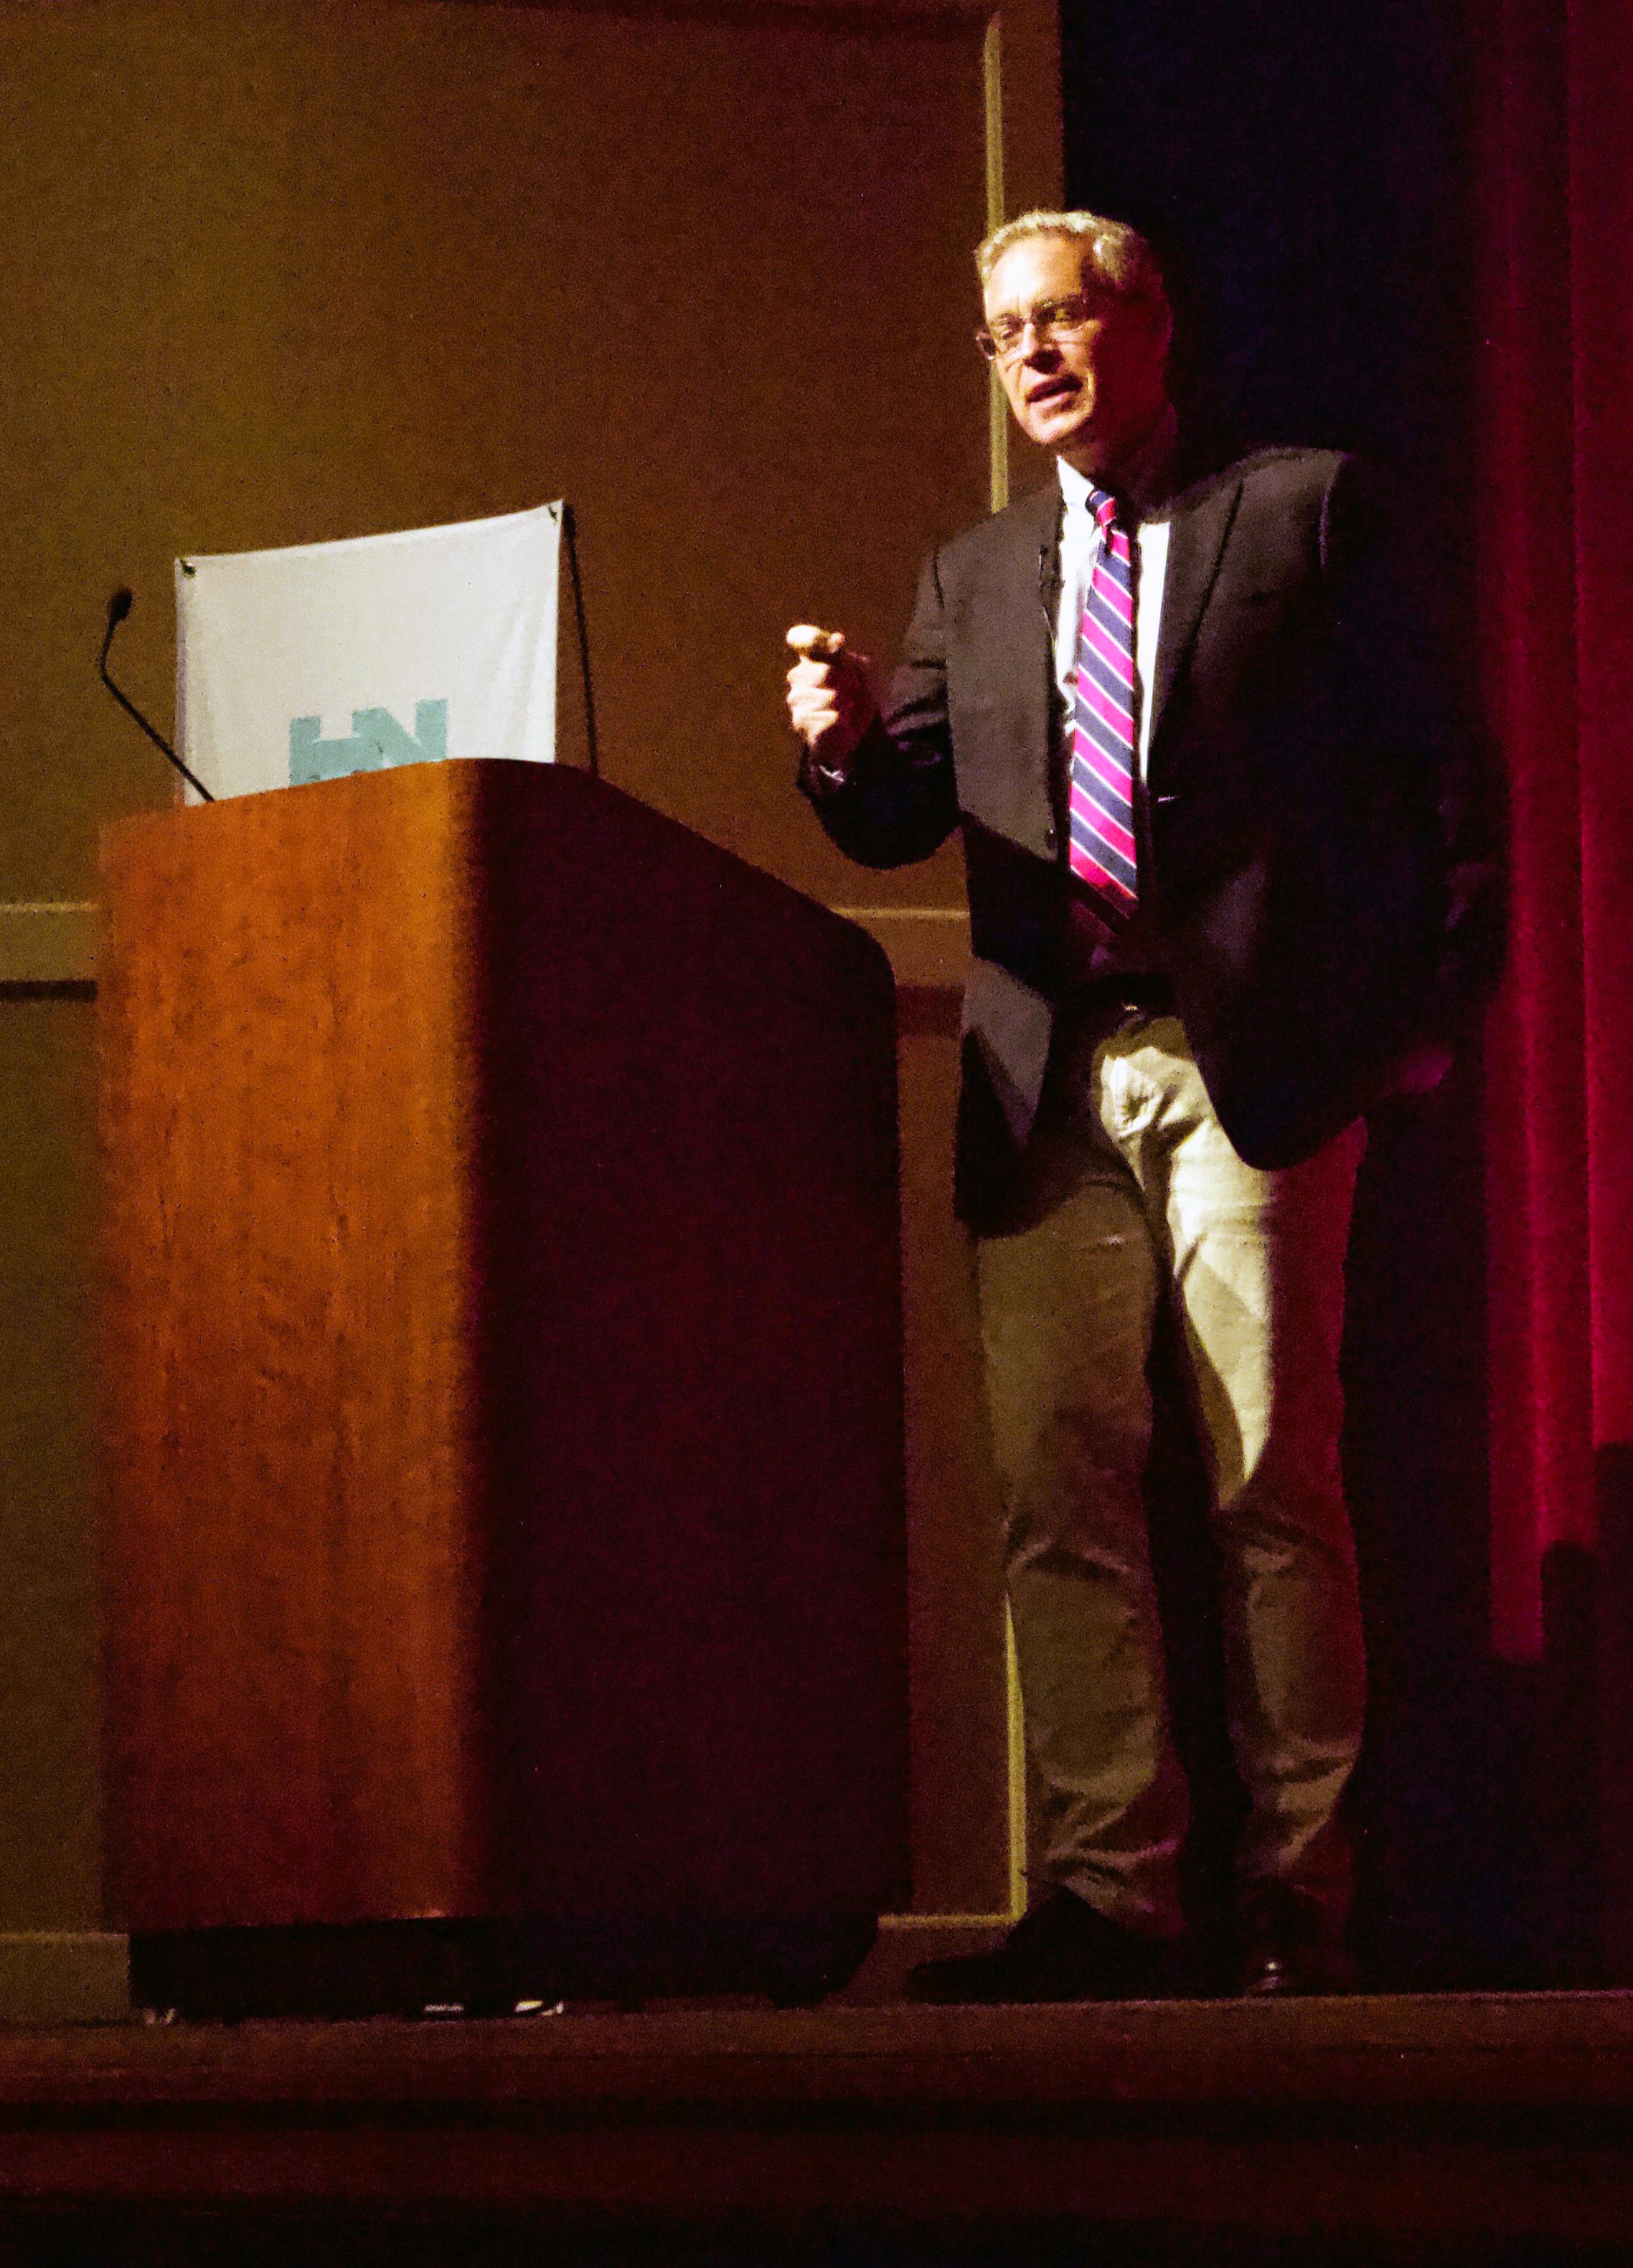 Keynote by Dr. William I. Hitchcock